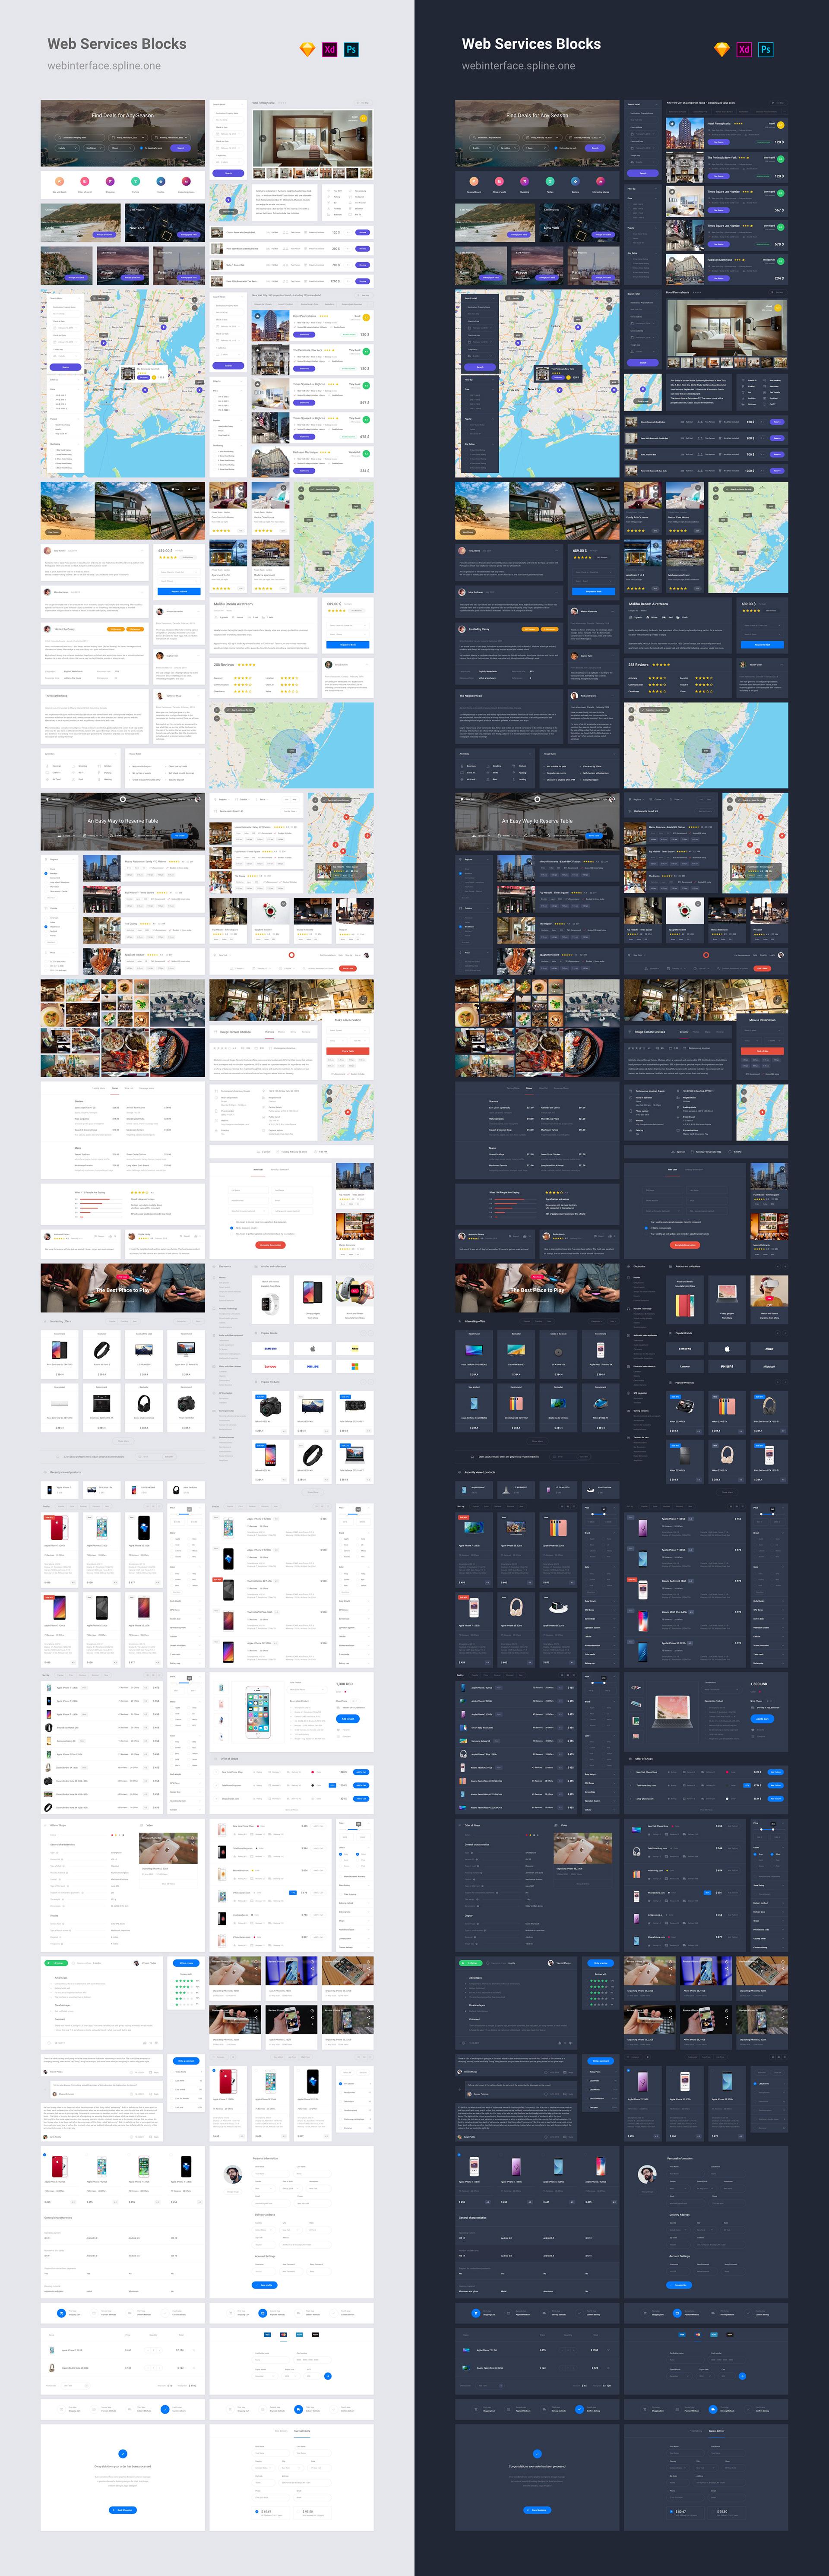 Web Interface 2 UI Kit – 150 шаблонов для Adobe XD, Photoshop и Sketch